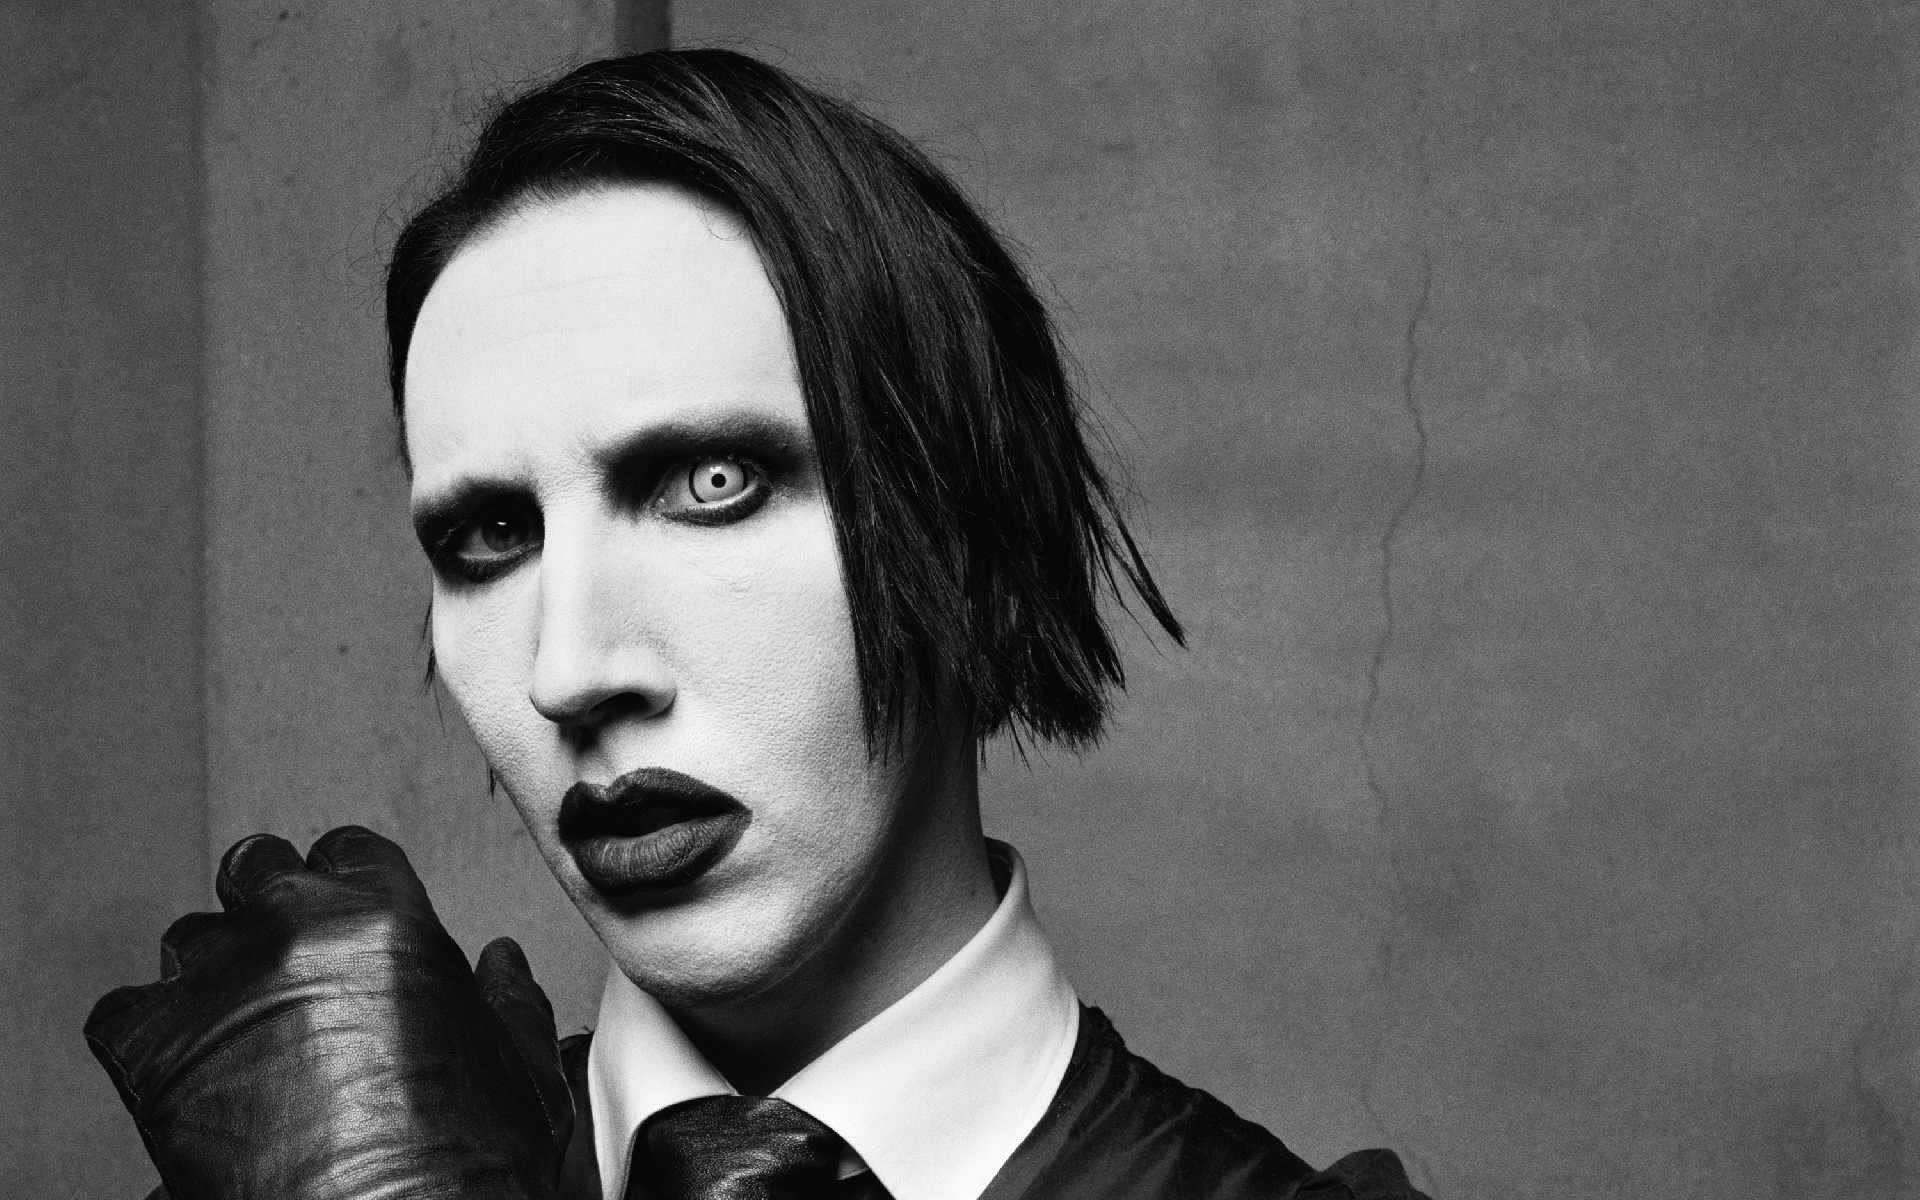 Marilyn Manson Wallpaper 57 Images